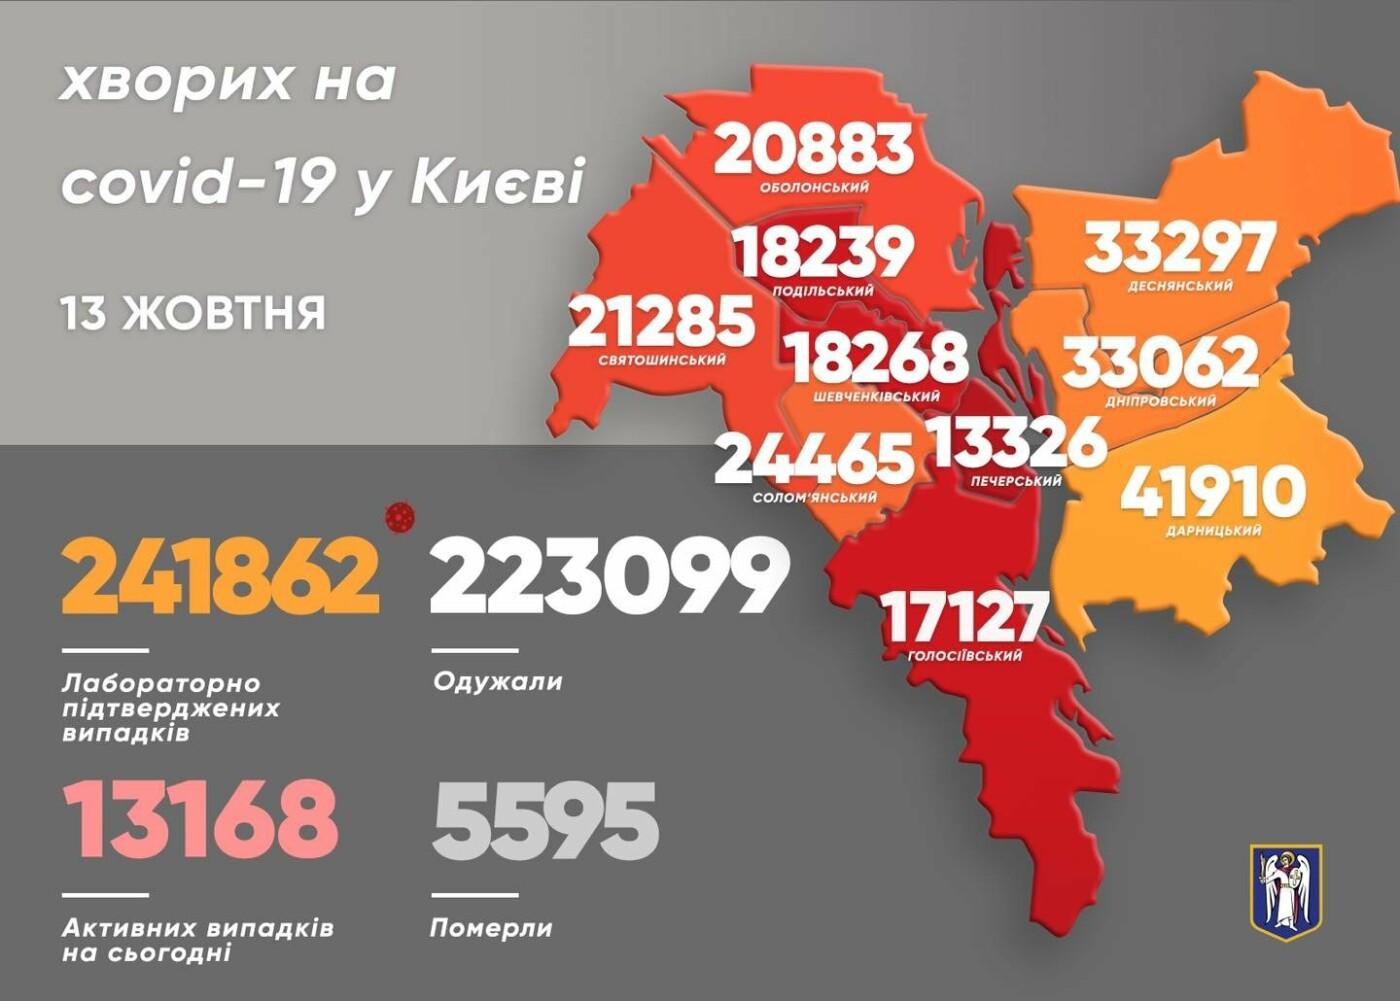 Статистика коронавируса на 12 октября 2021